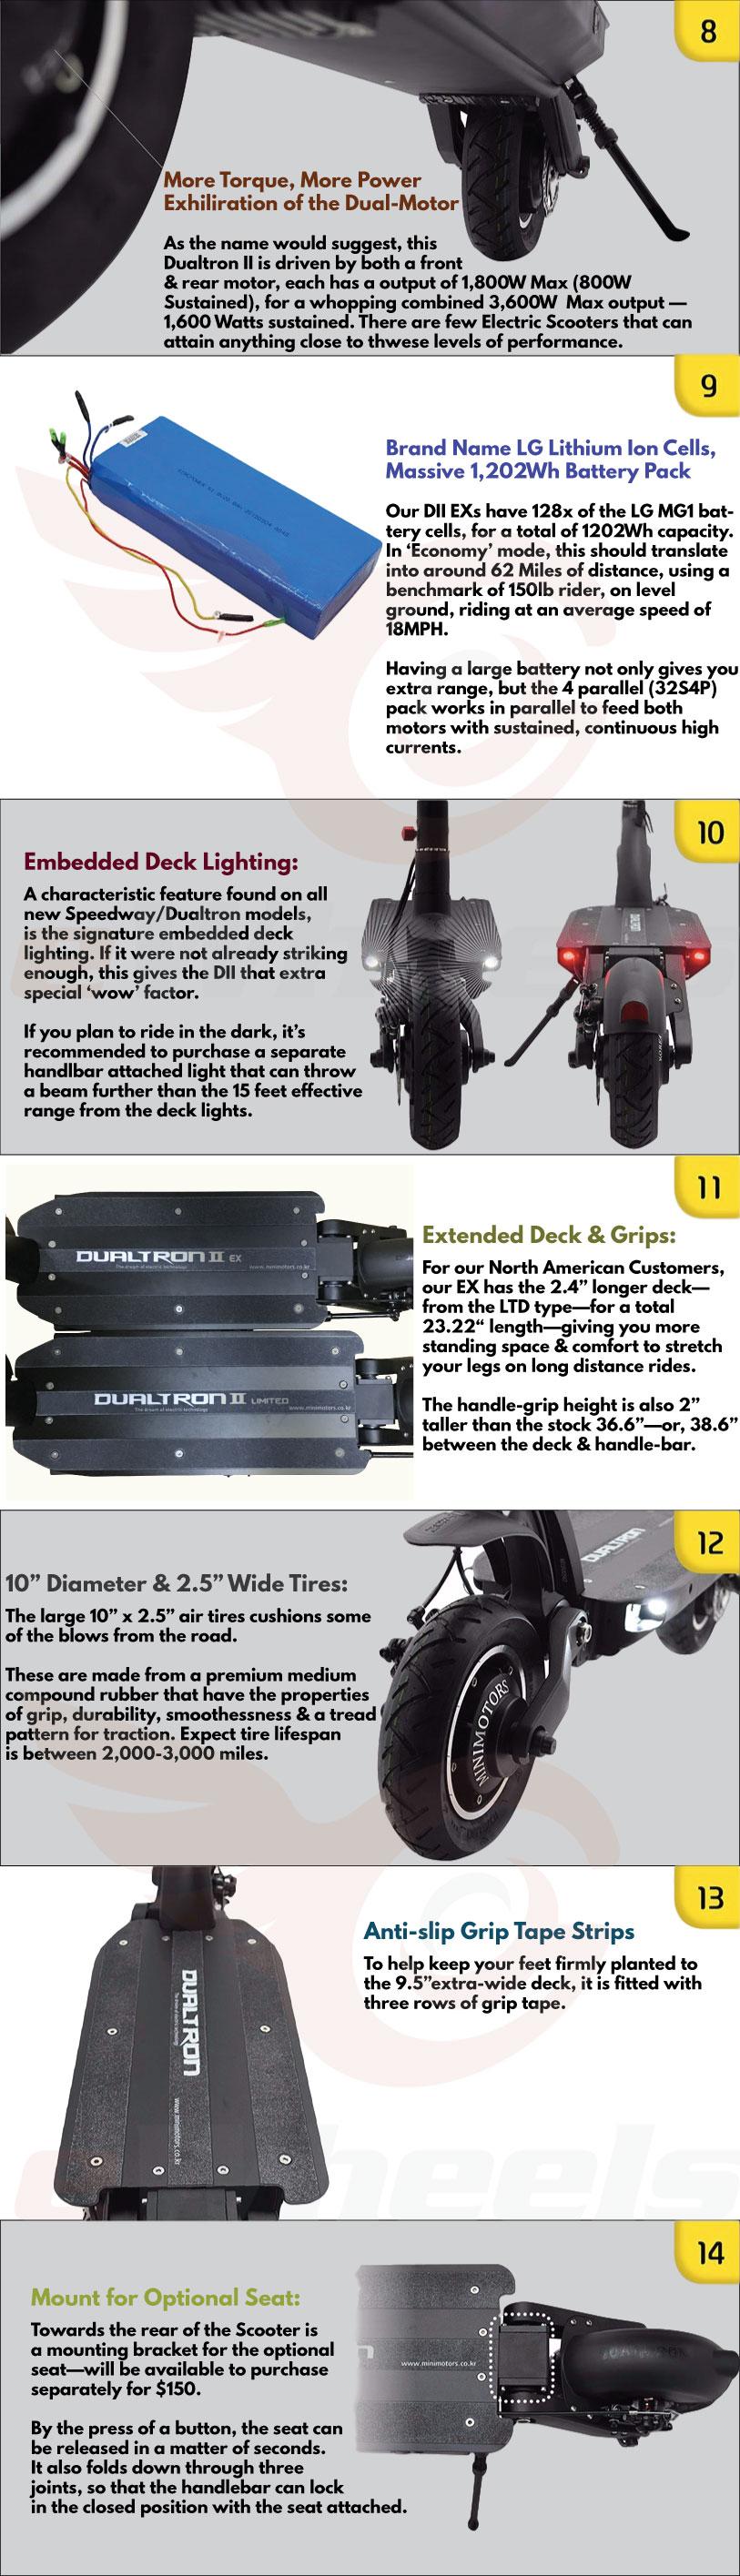 Dualtron II 2 EX EX+ LTD Minimotors Product Sheet 2